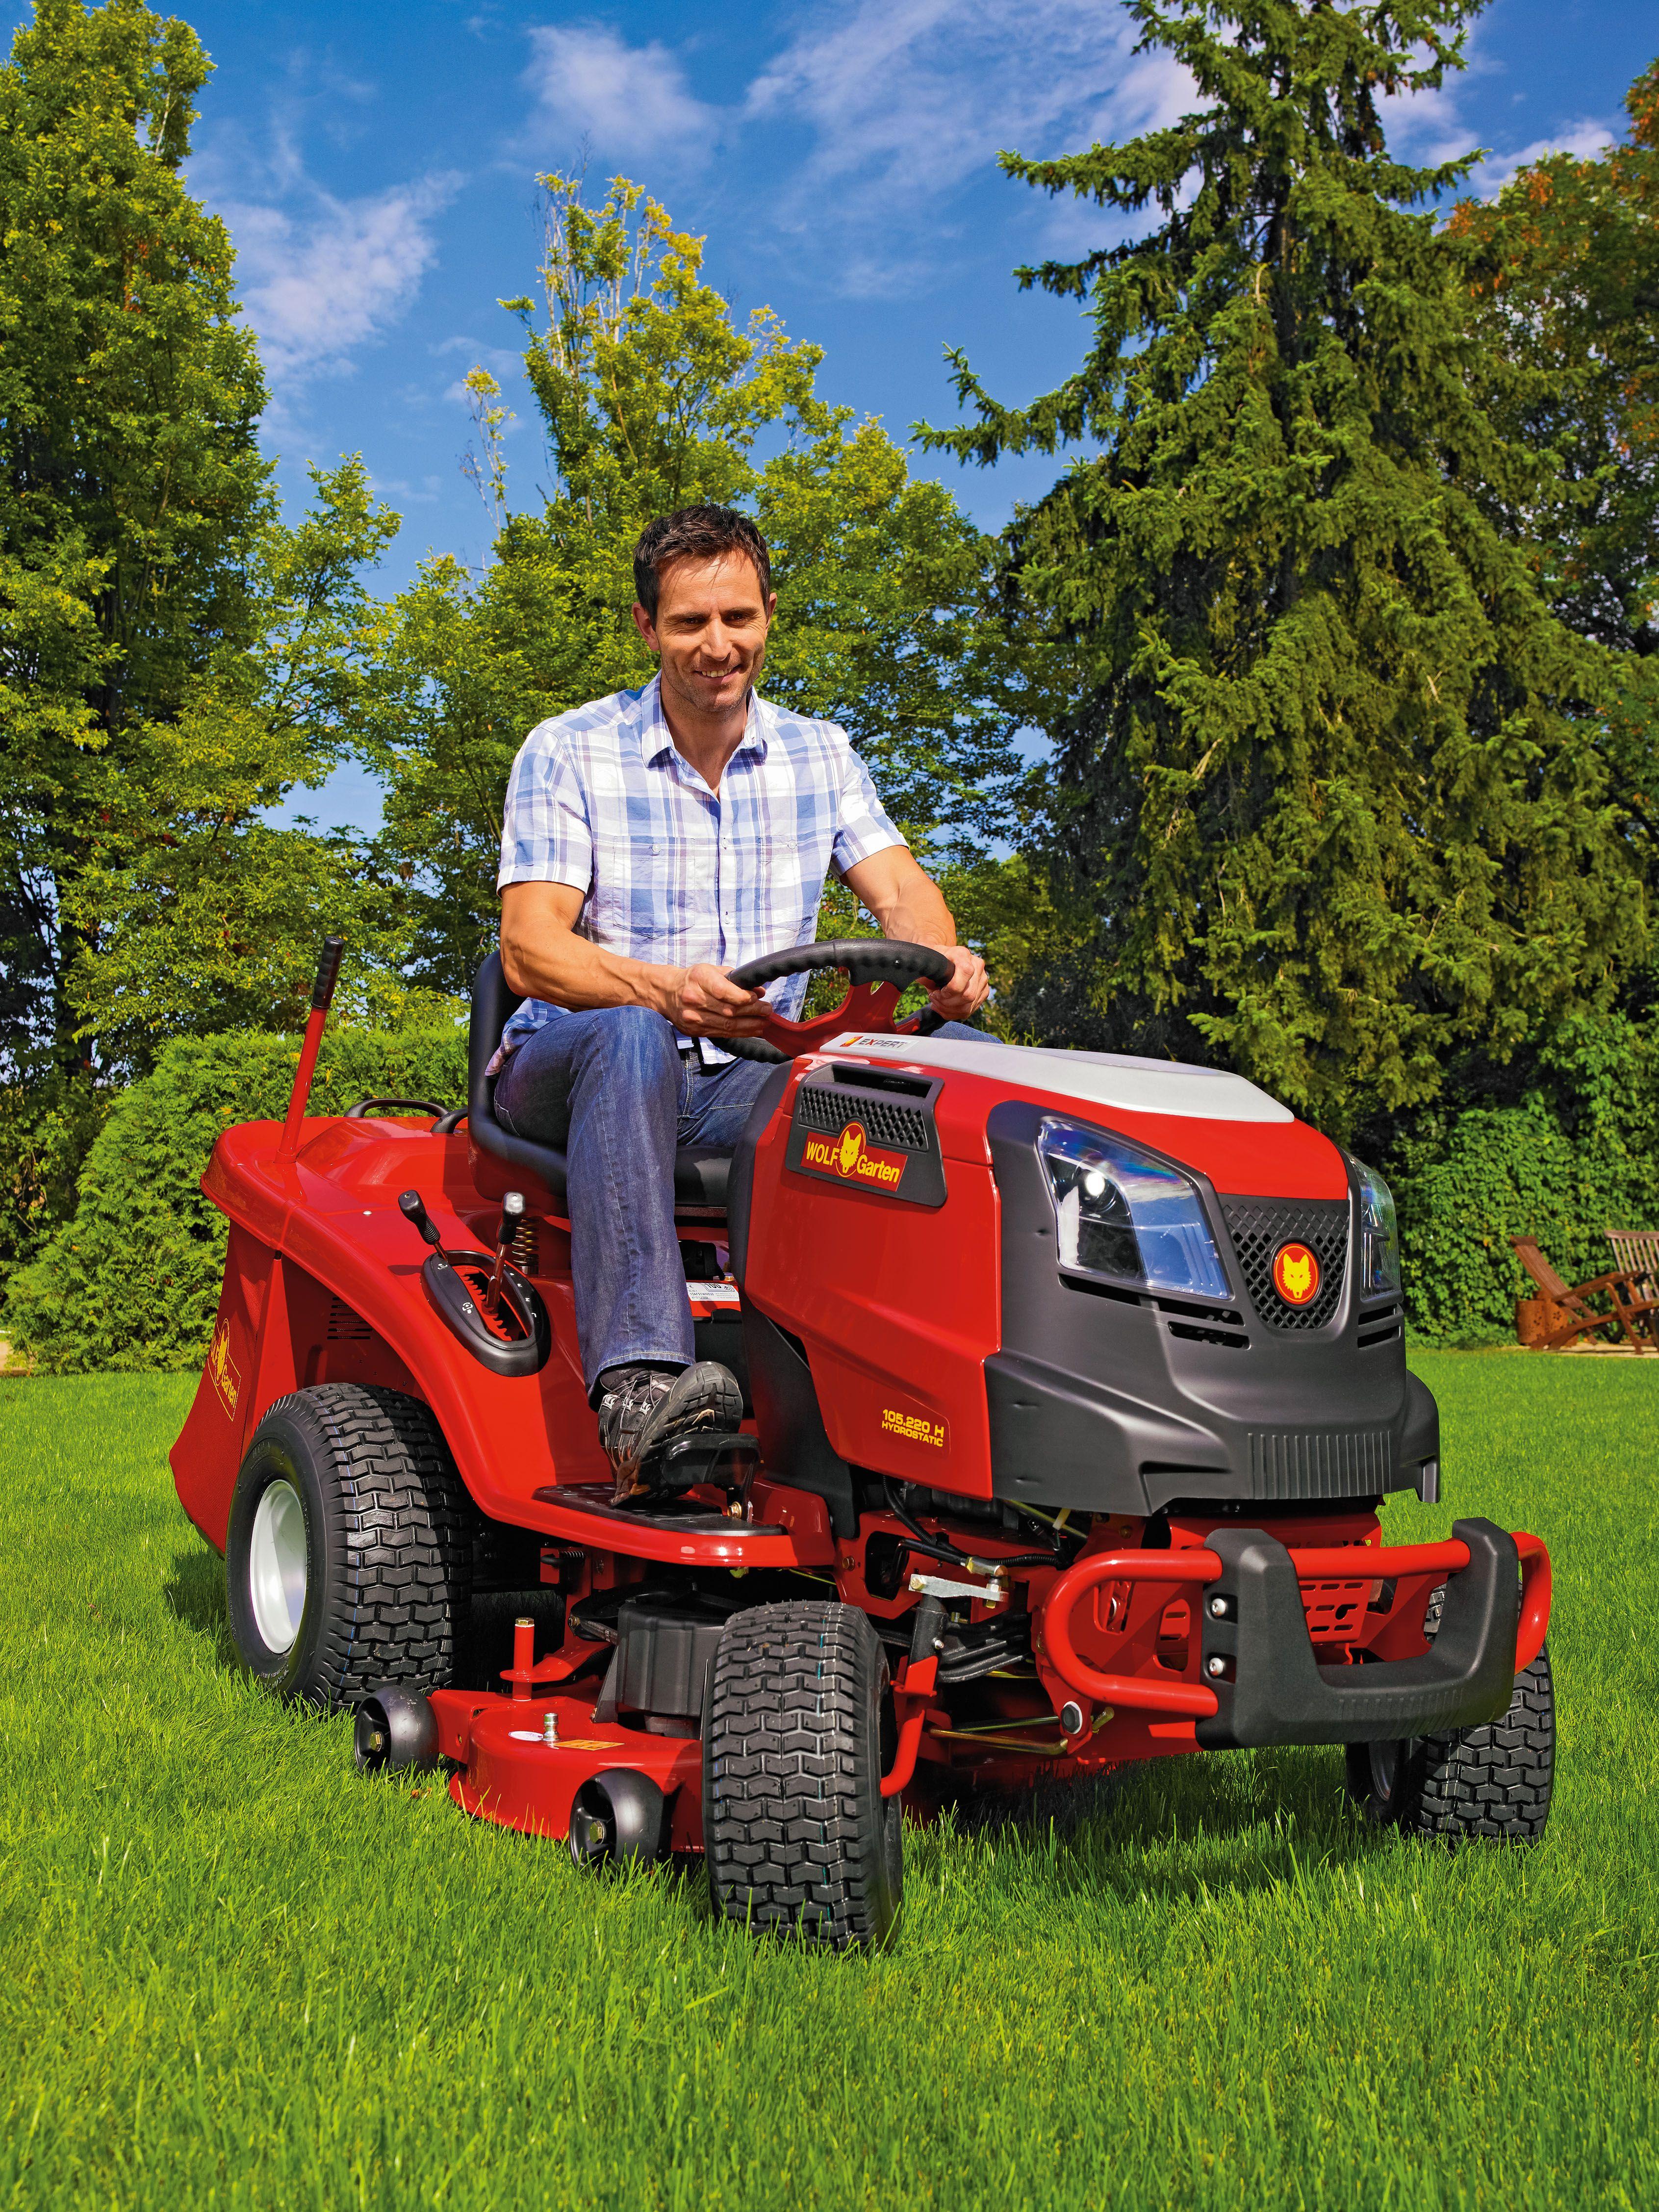 Blue Power 105 200h Lawn Tractor 4 Best Lawn Mower Lawn Tractor Lawn Mowers